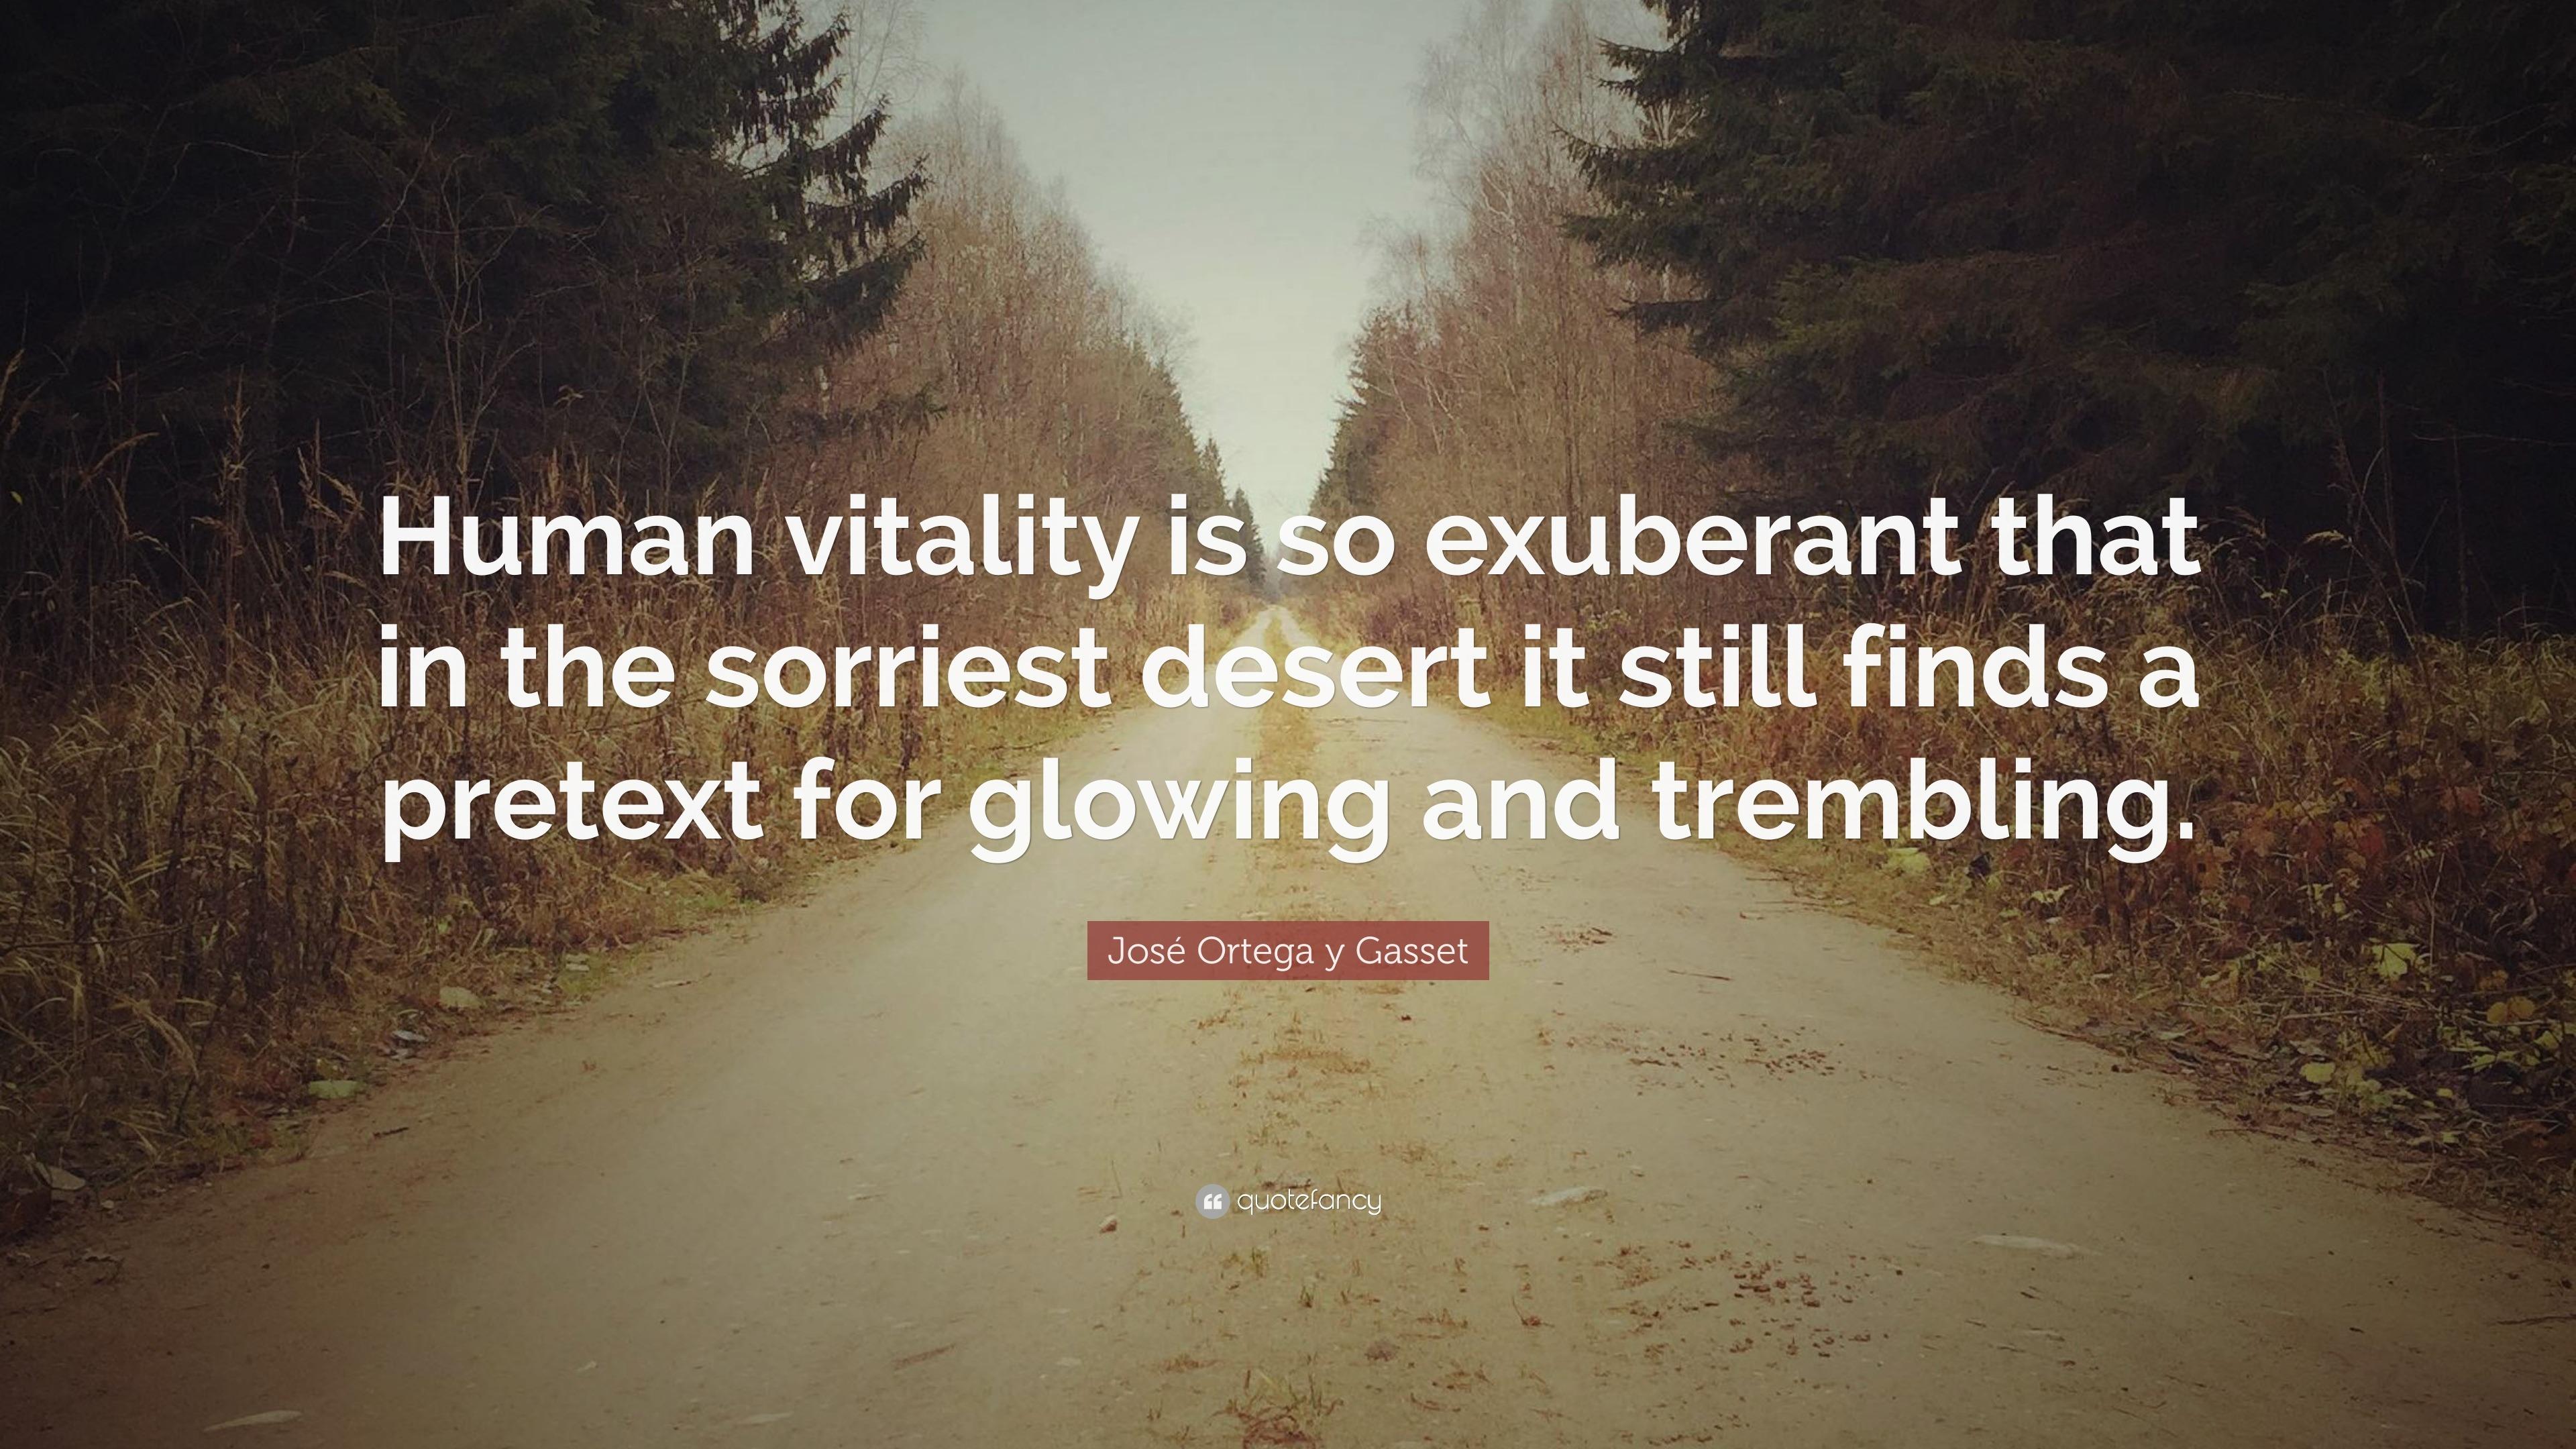 José Ortega Y Gasset Quote Human Vitality Is So Exuberant